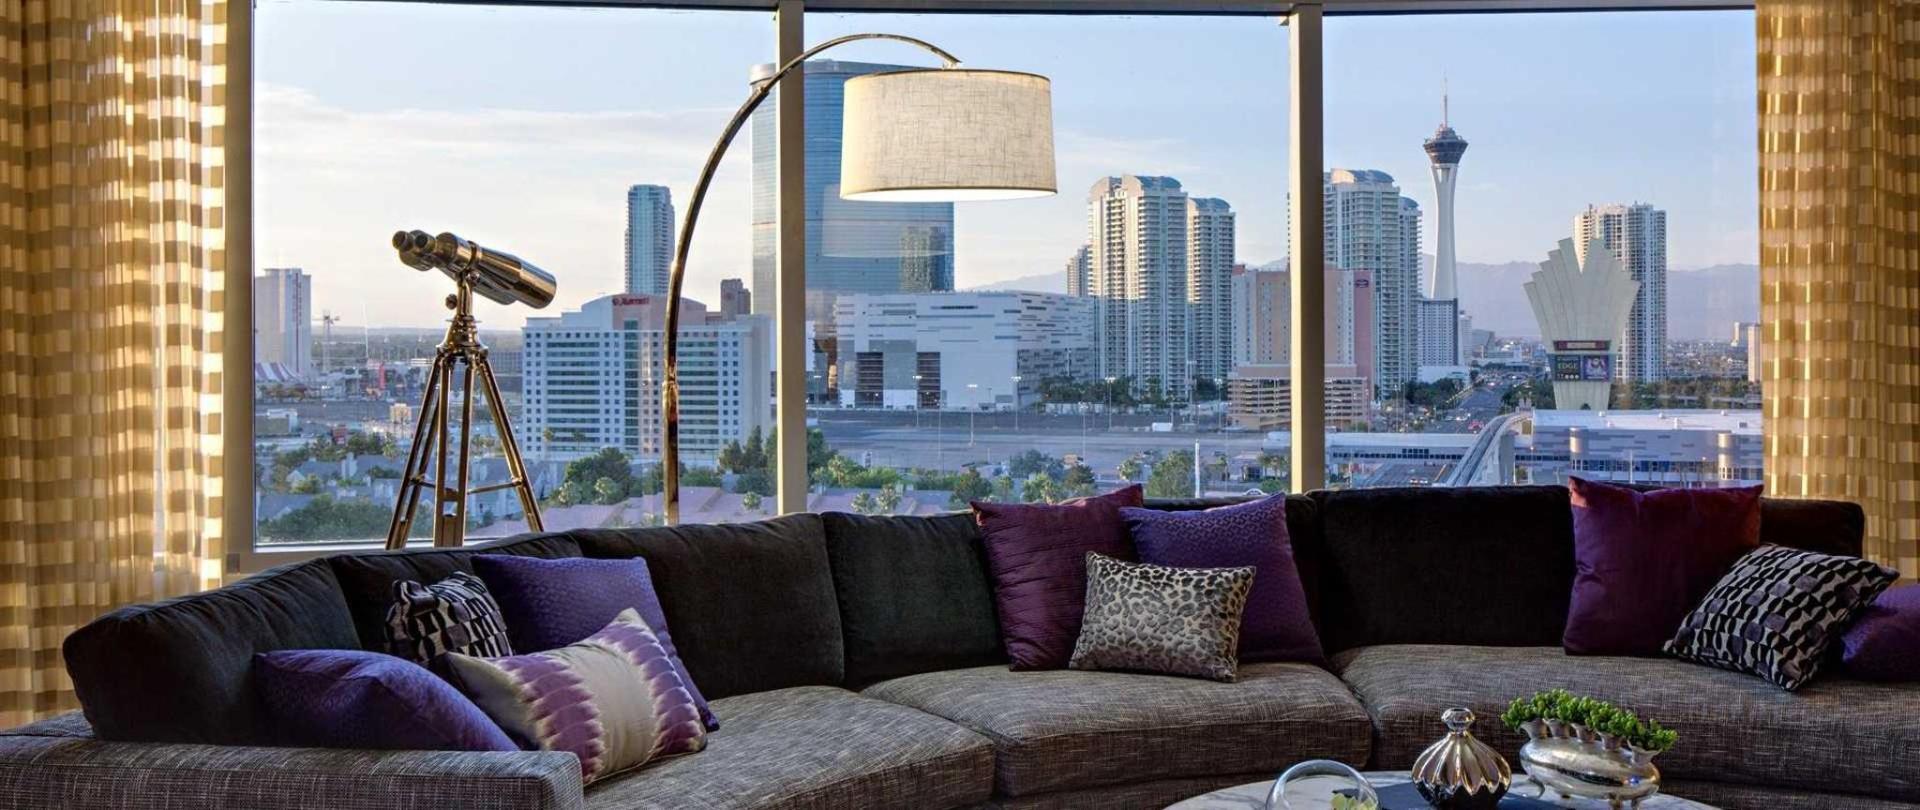 Photos – Renaissance Las Vegas Hotel – Las Vegas – United States of ...